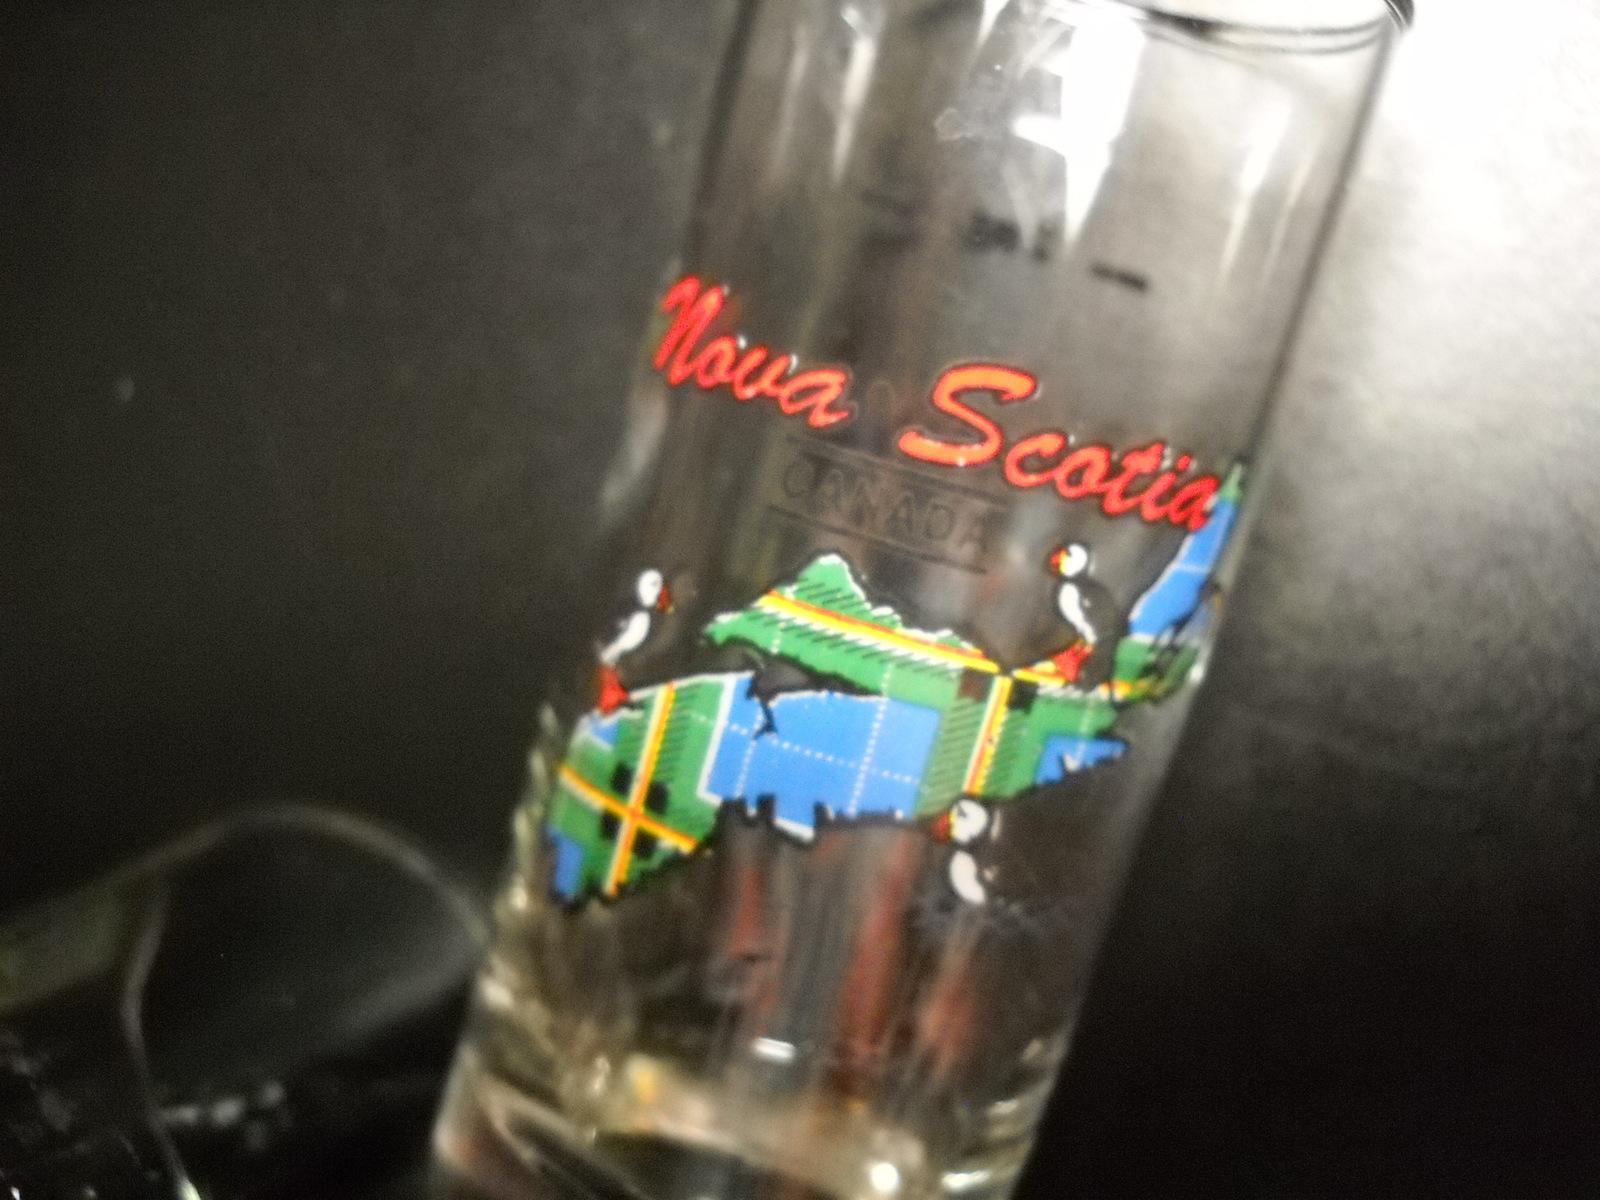 Nova Scotia Canada Shot Glass Tall Style Blue Tartan Island with Lots of Puffins